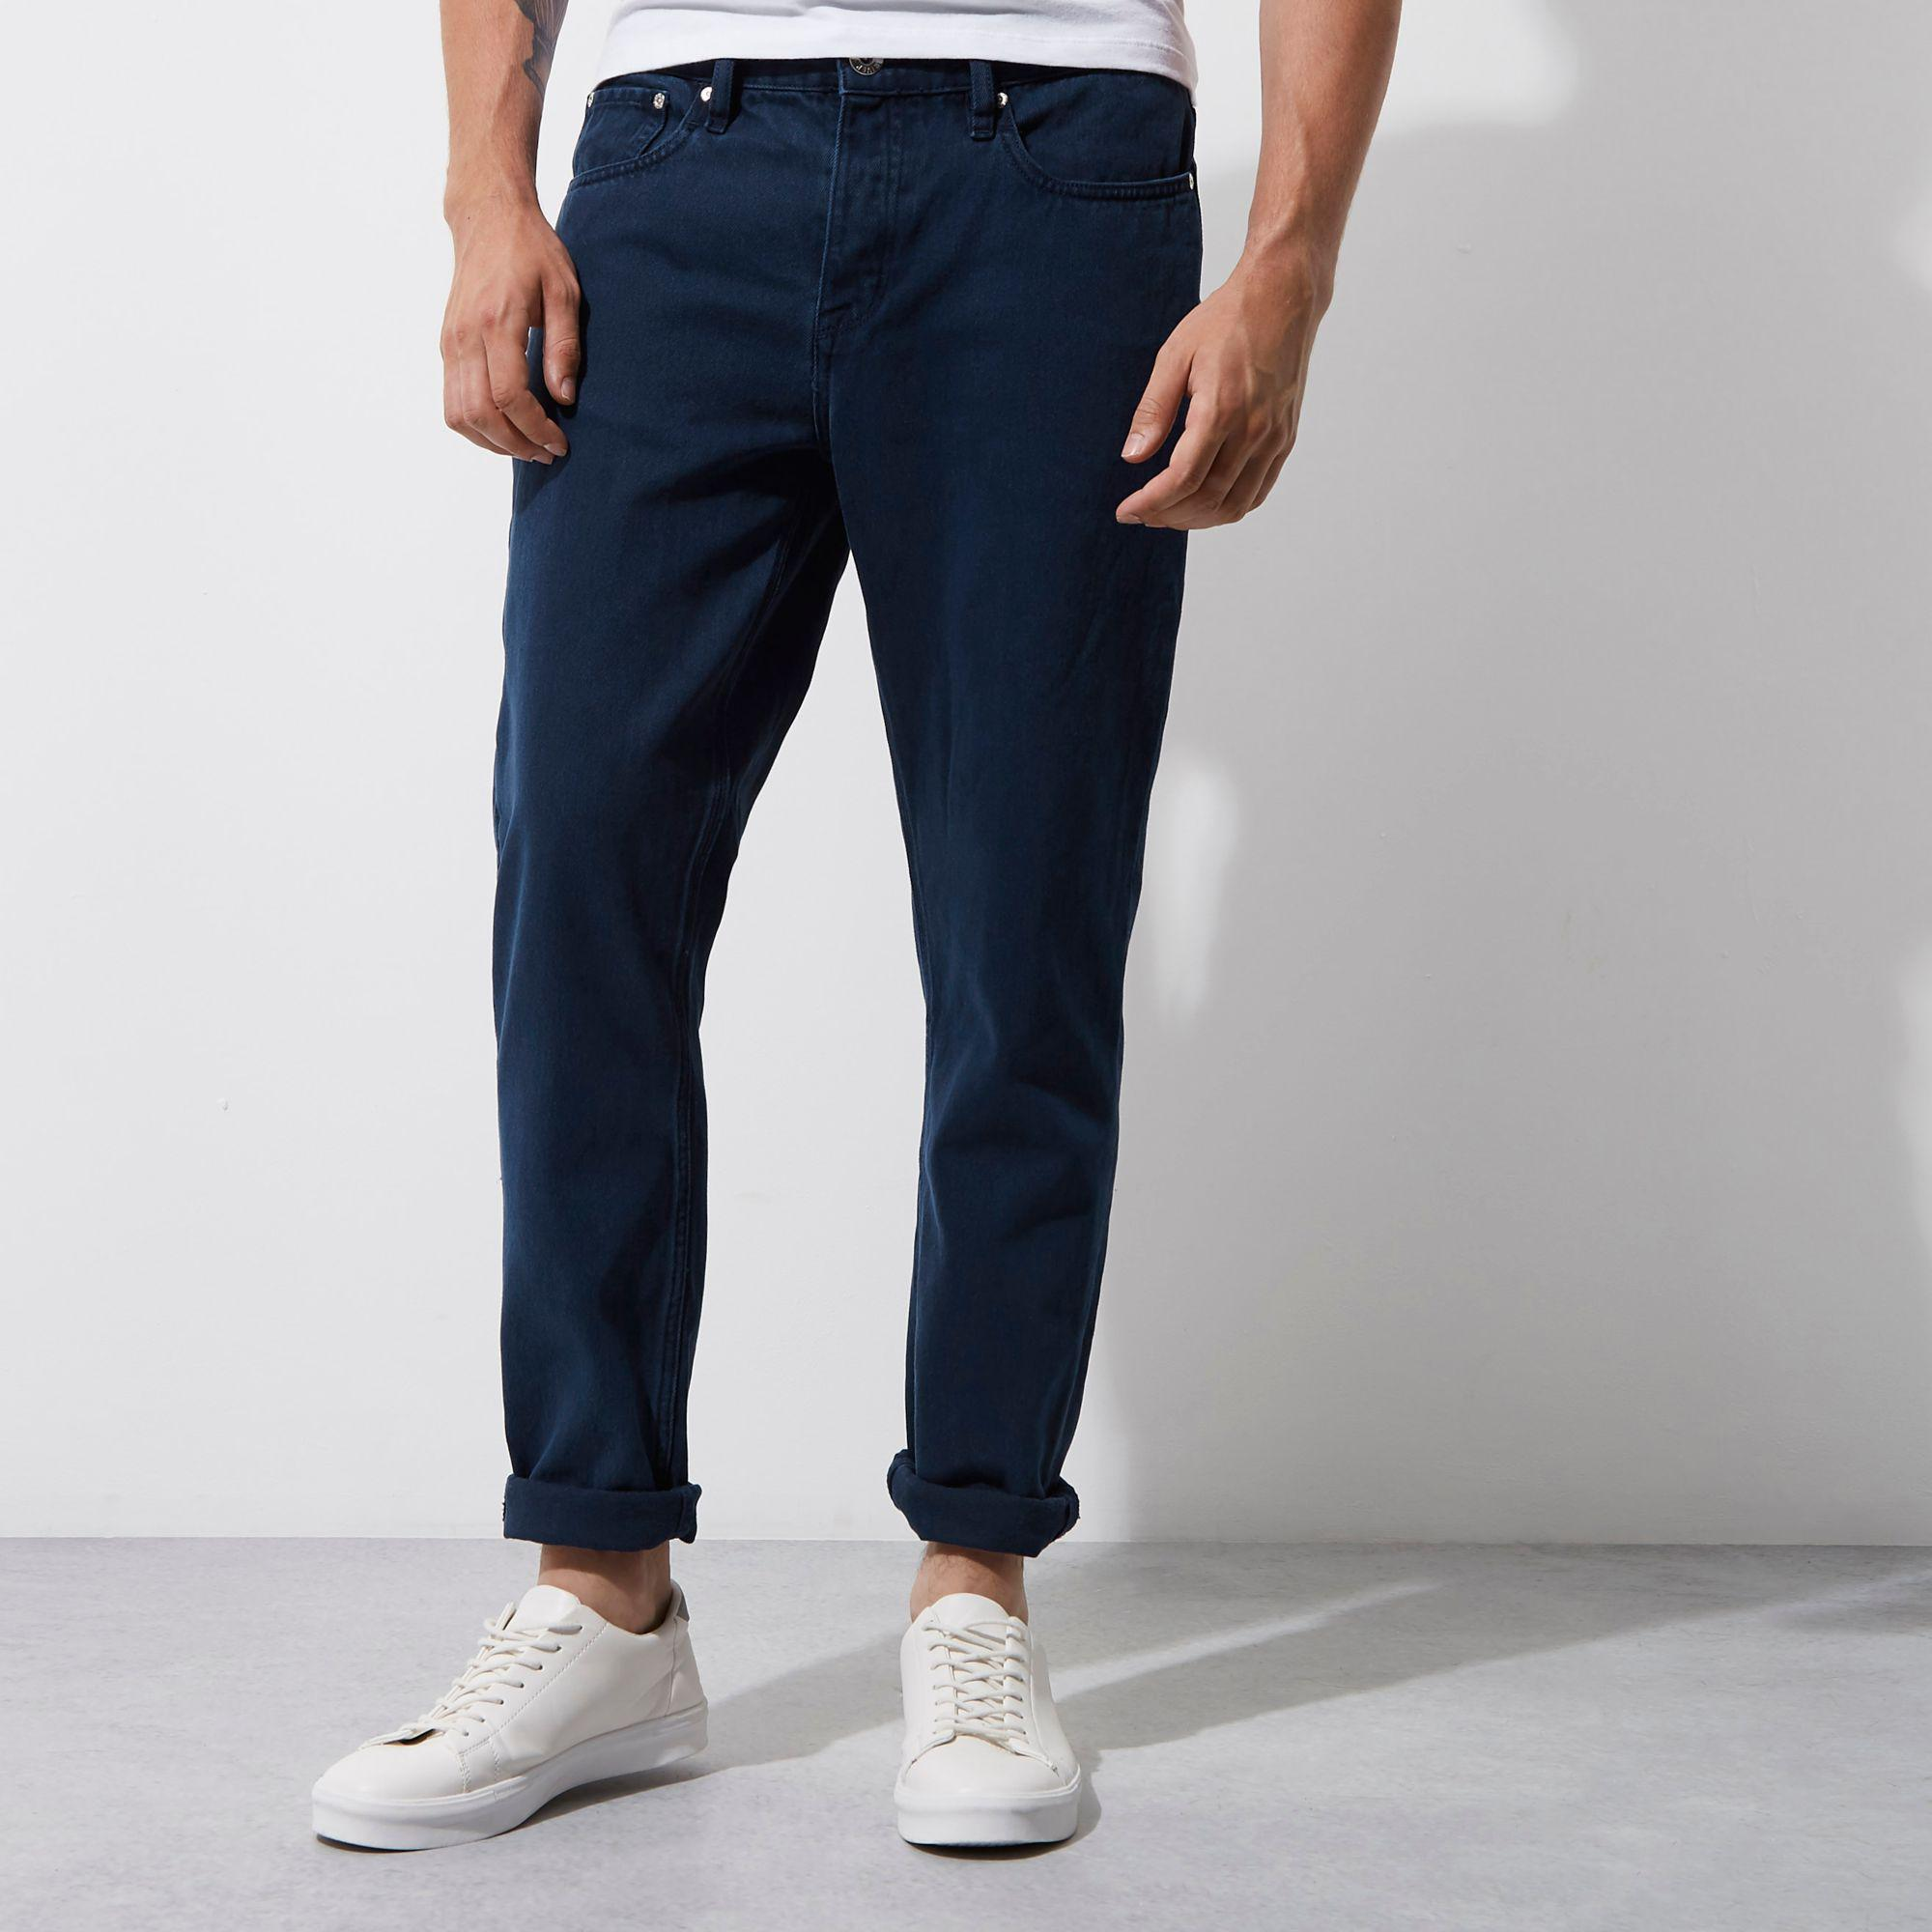 River Island Denim Jimmy Slim Tapered Jeans in Blue for Men